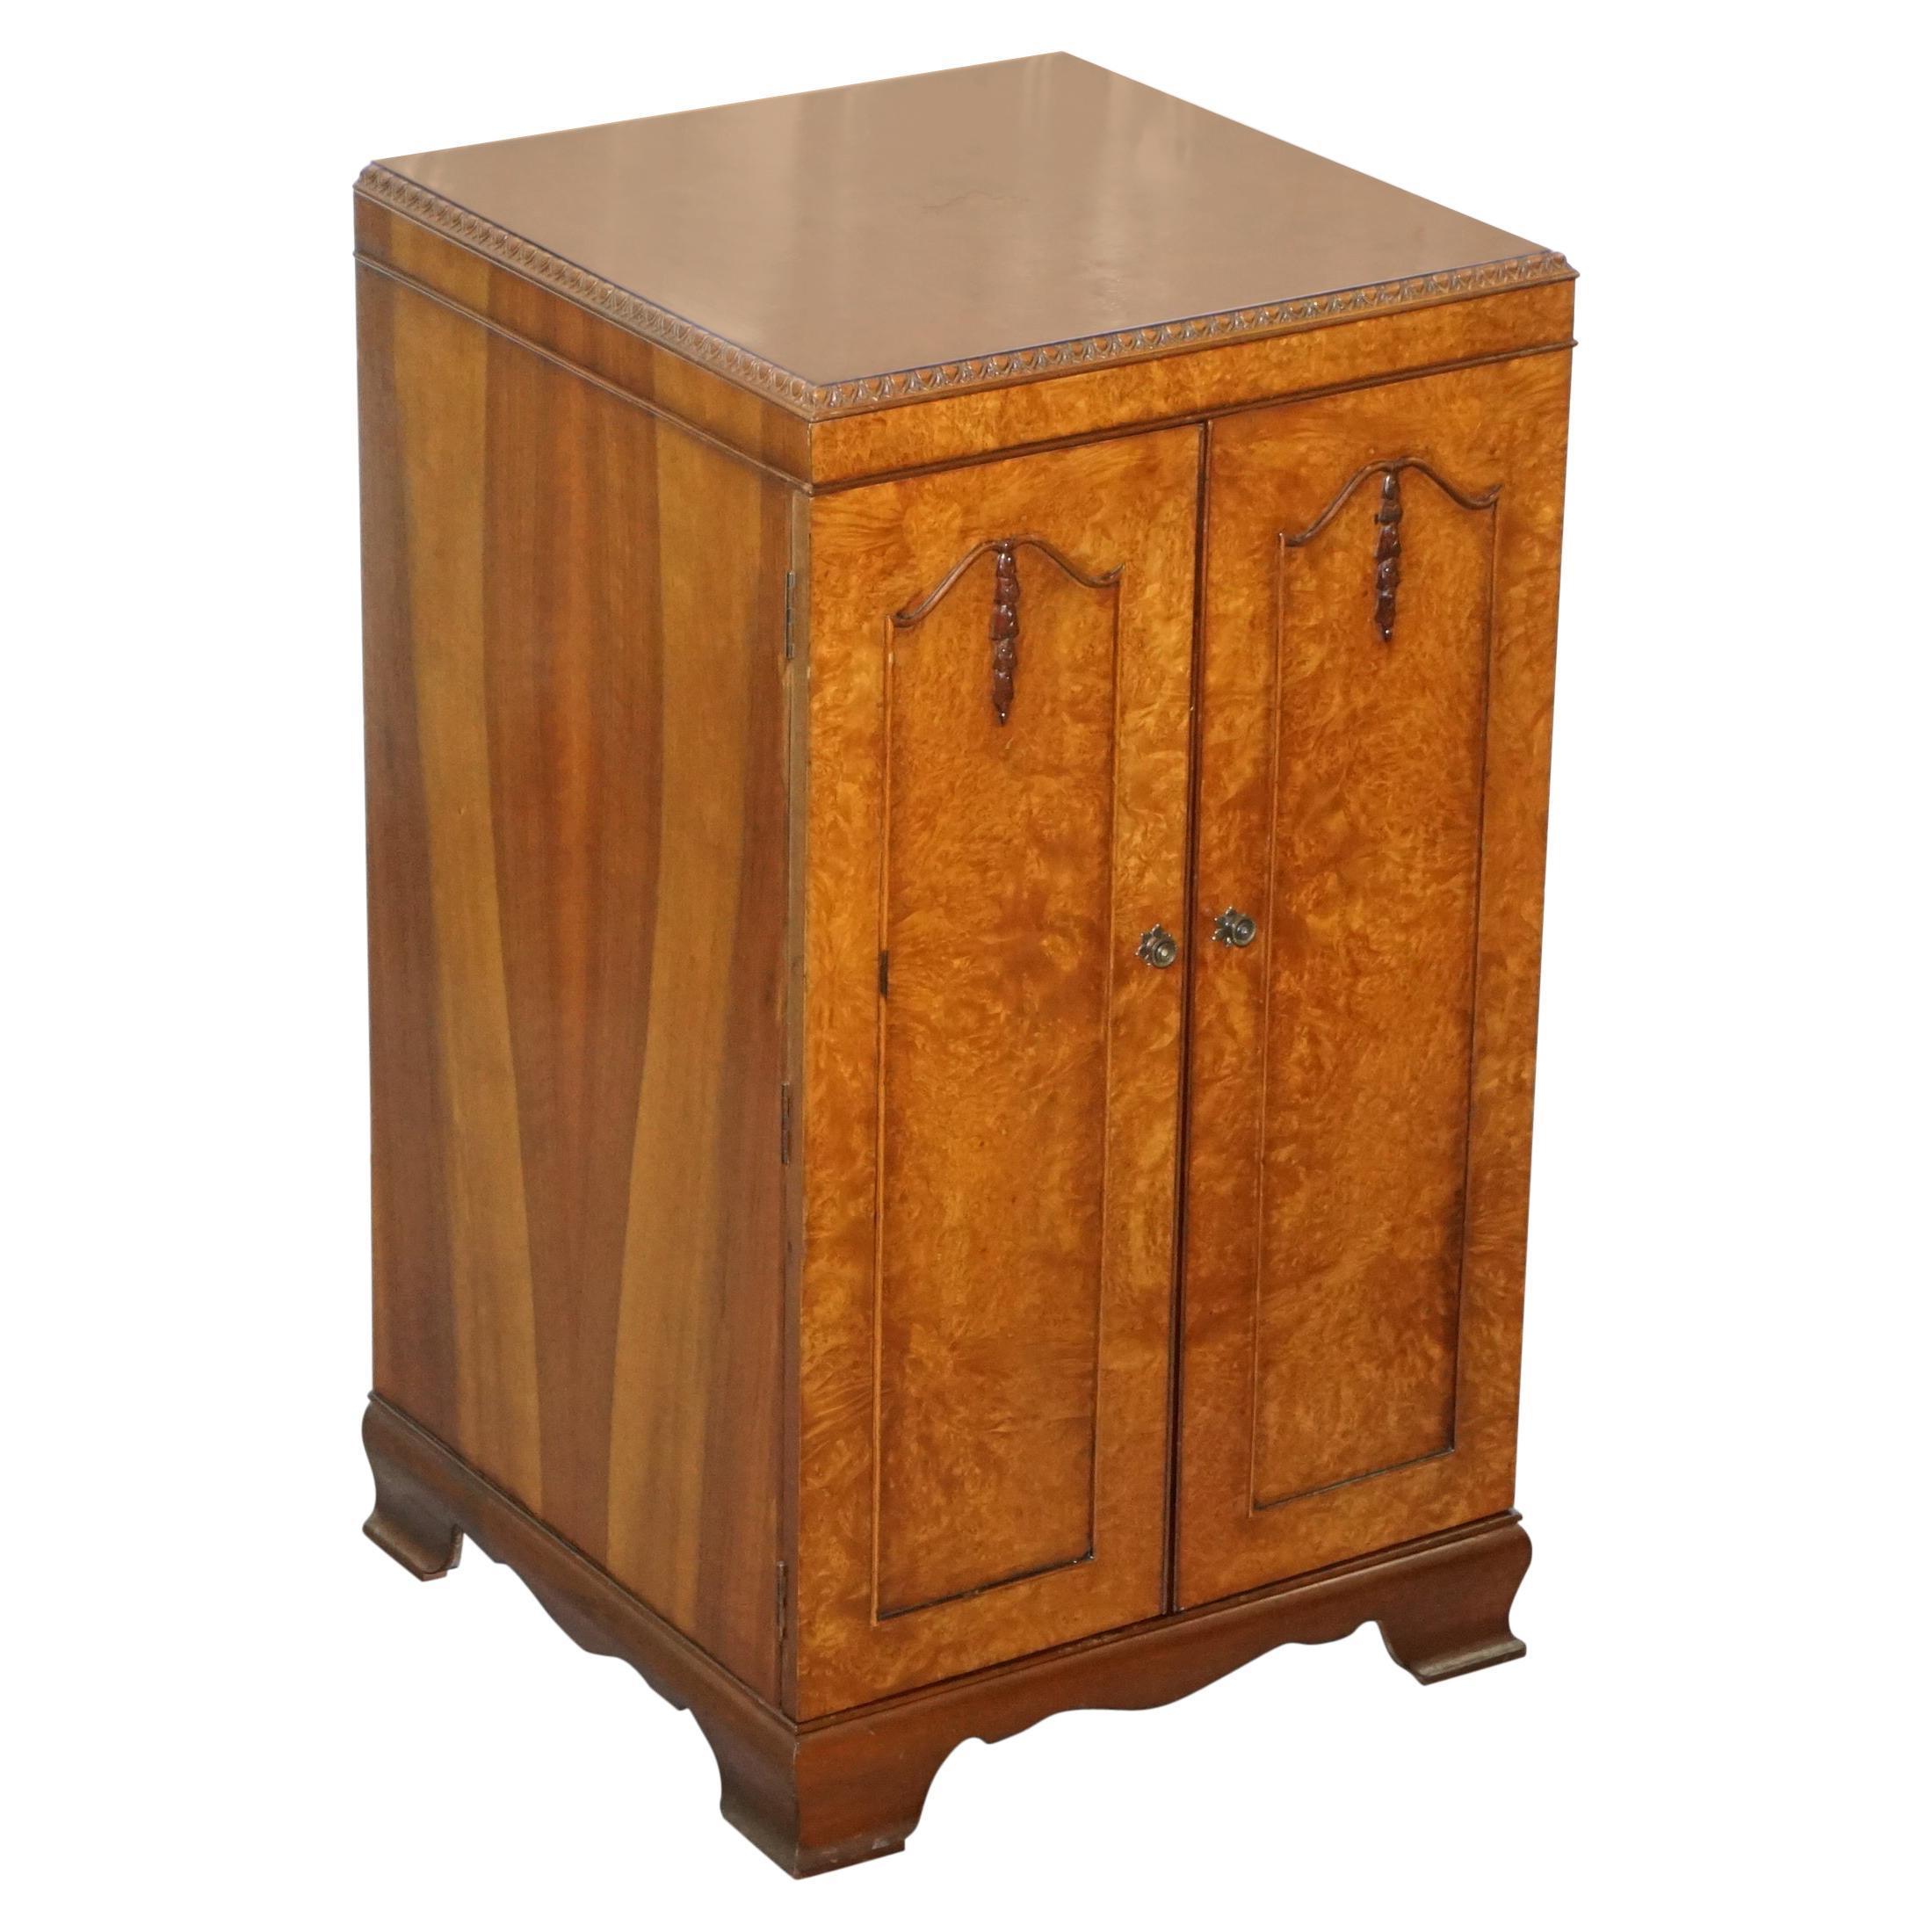 Burr Walnut circa 1920 Art Deco Drinks Cabinet Mirrored Back Lovely Tallboy Size